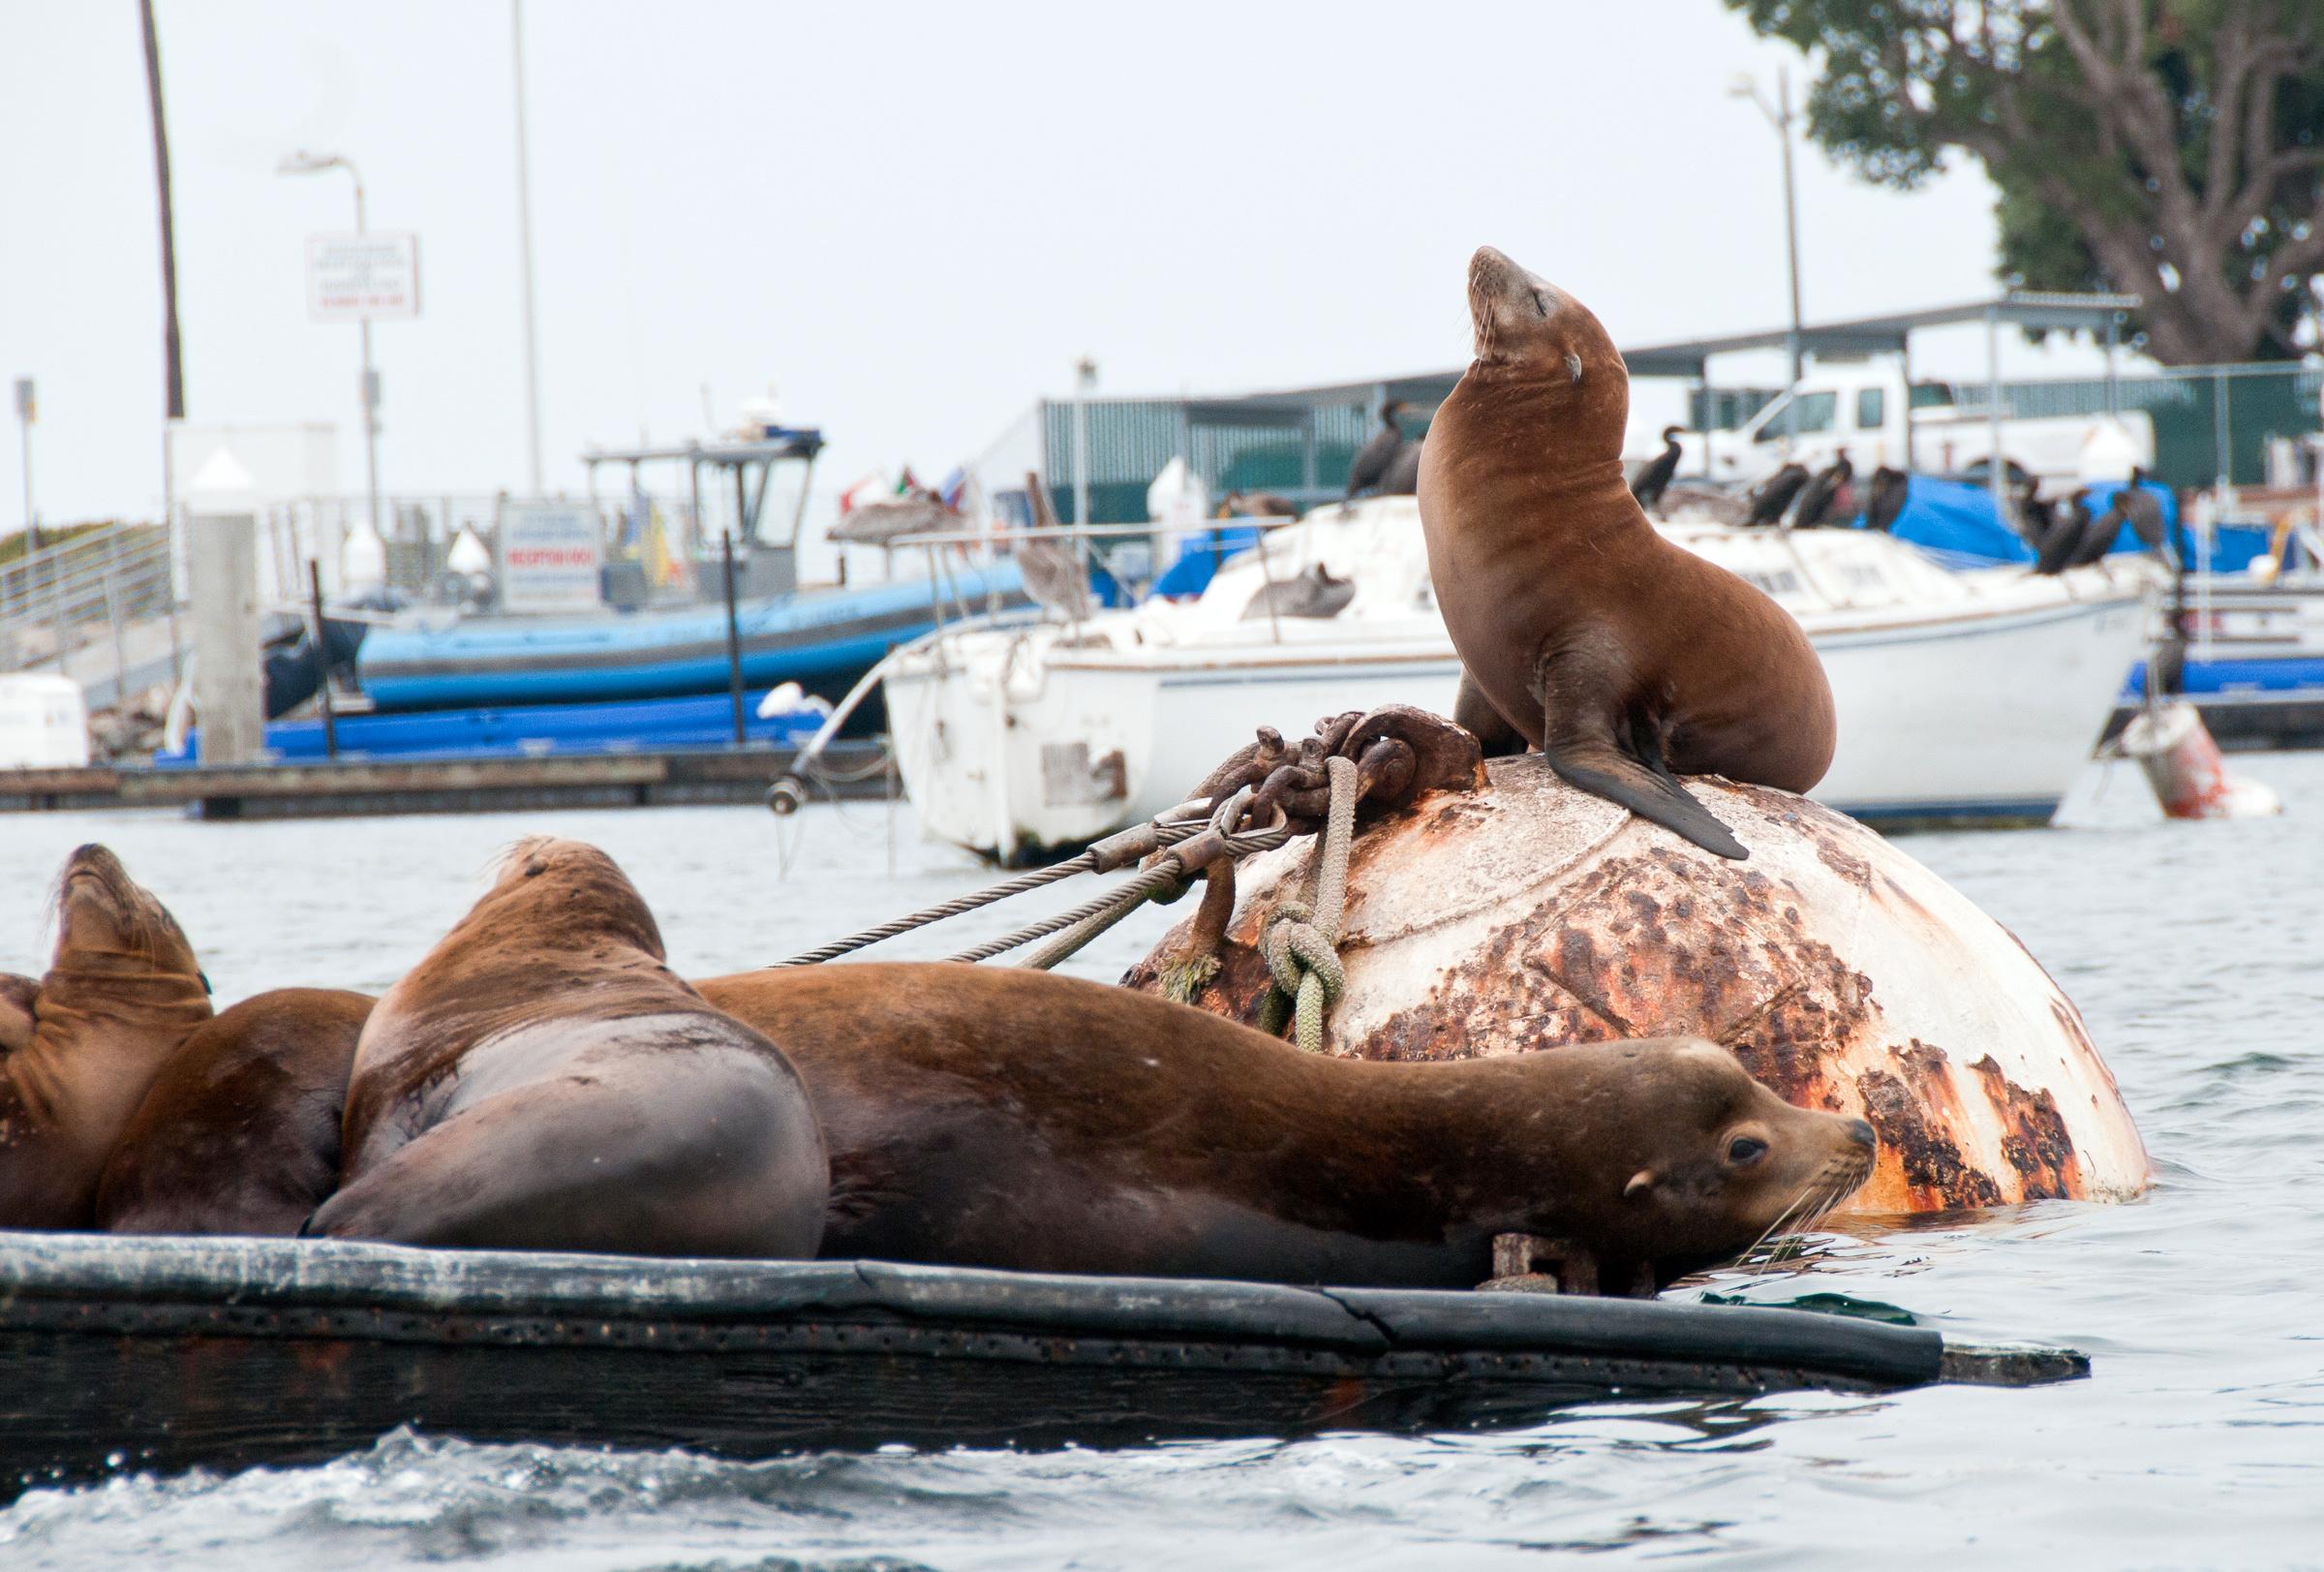 Sea Lions in San Diego marina